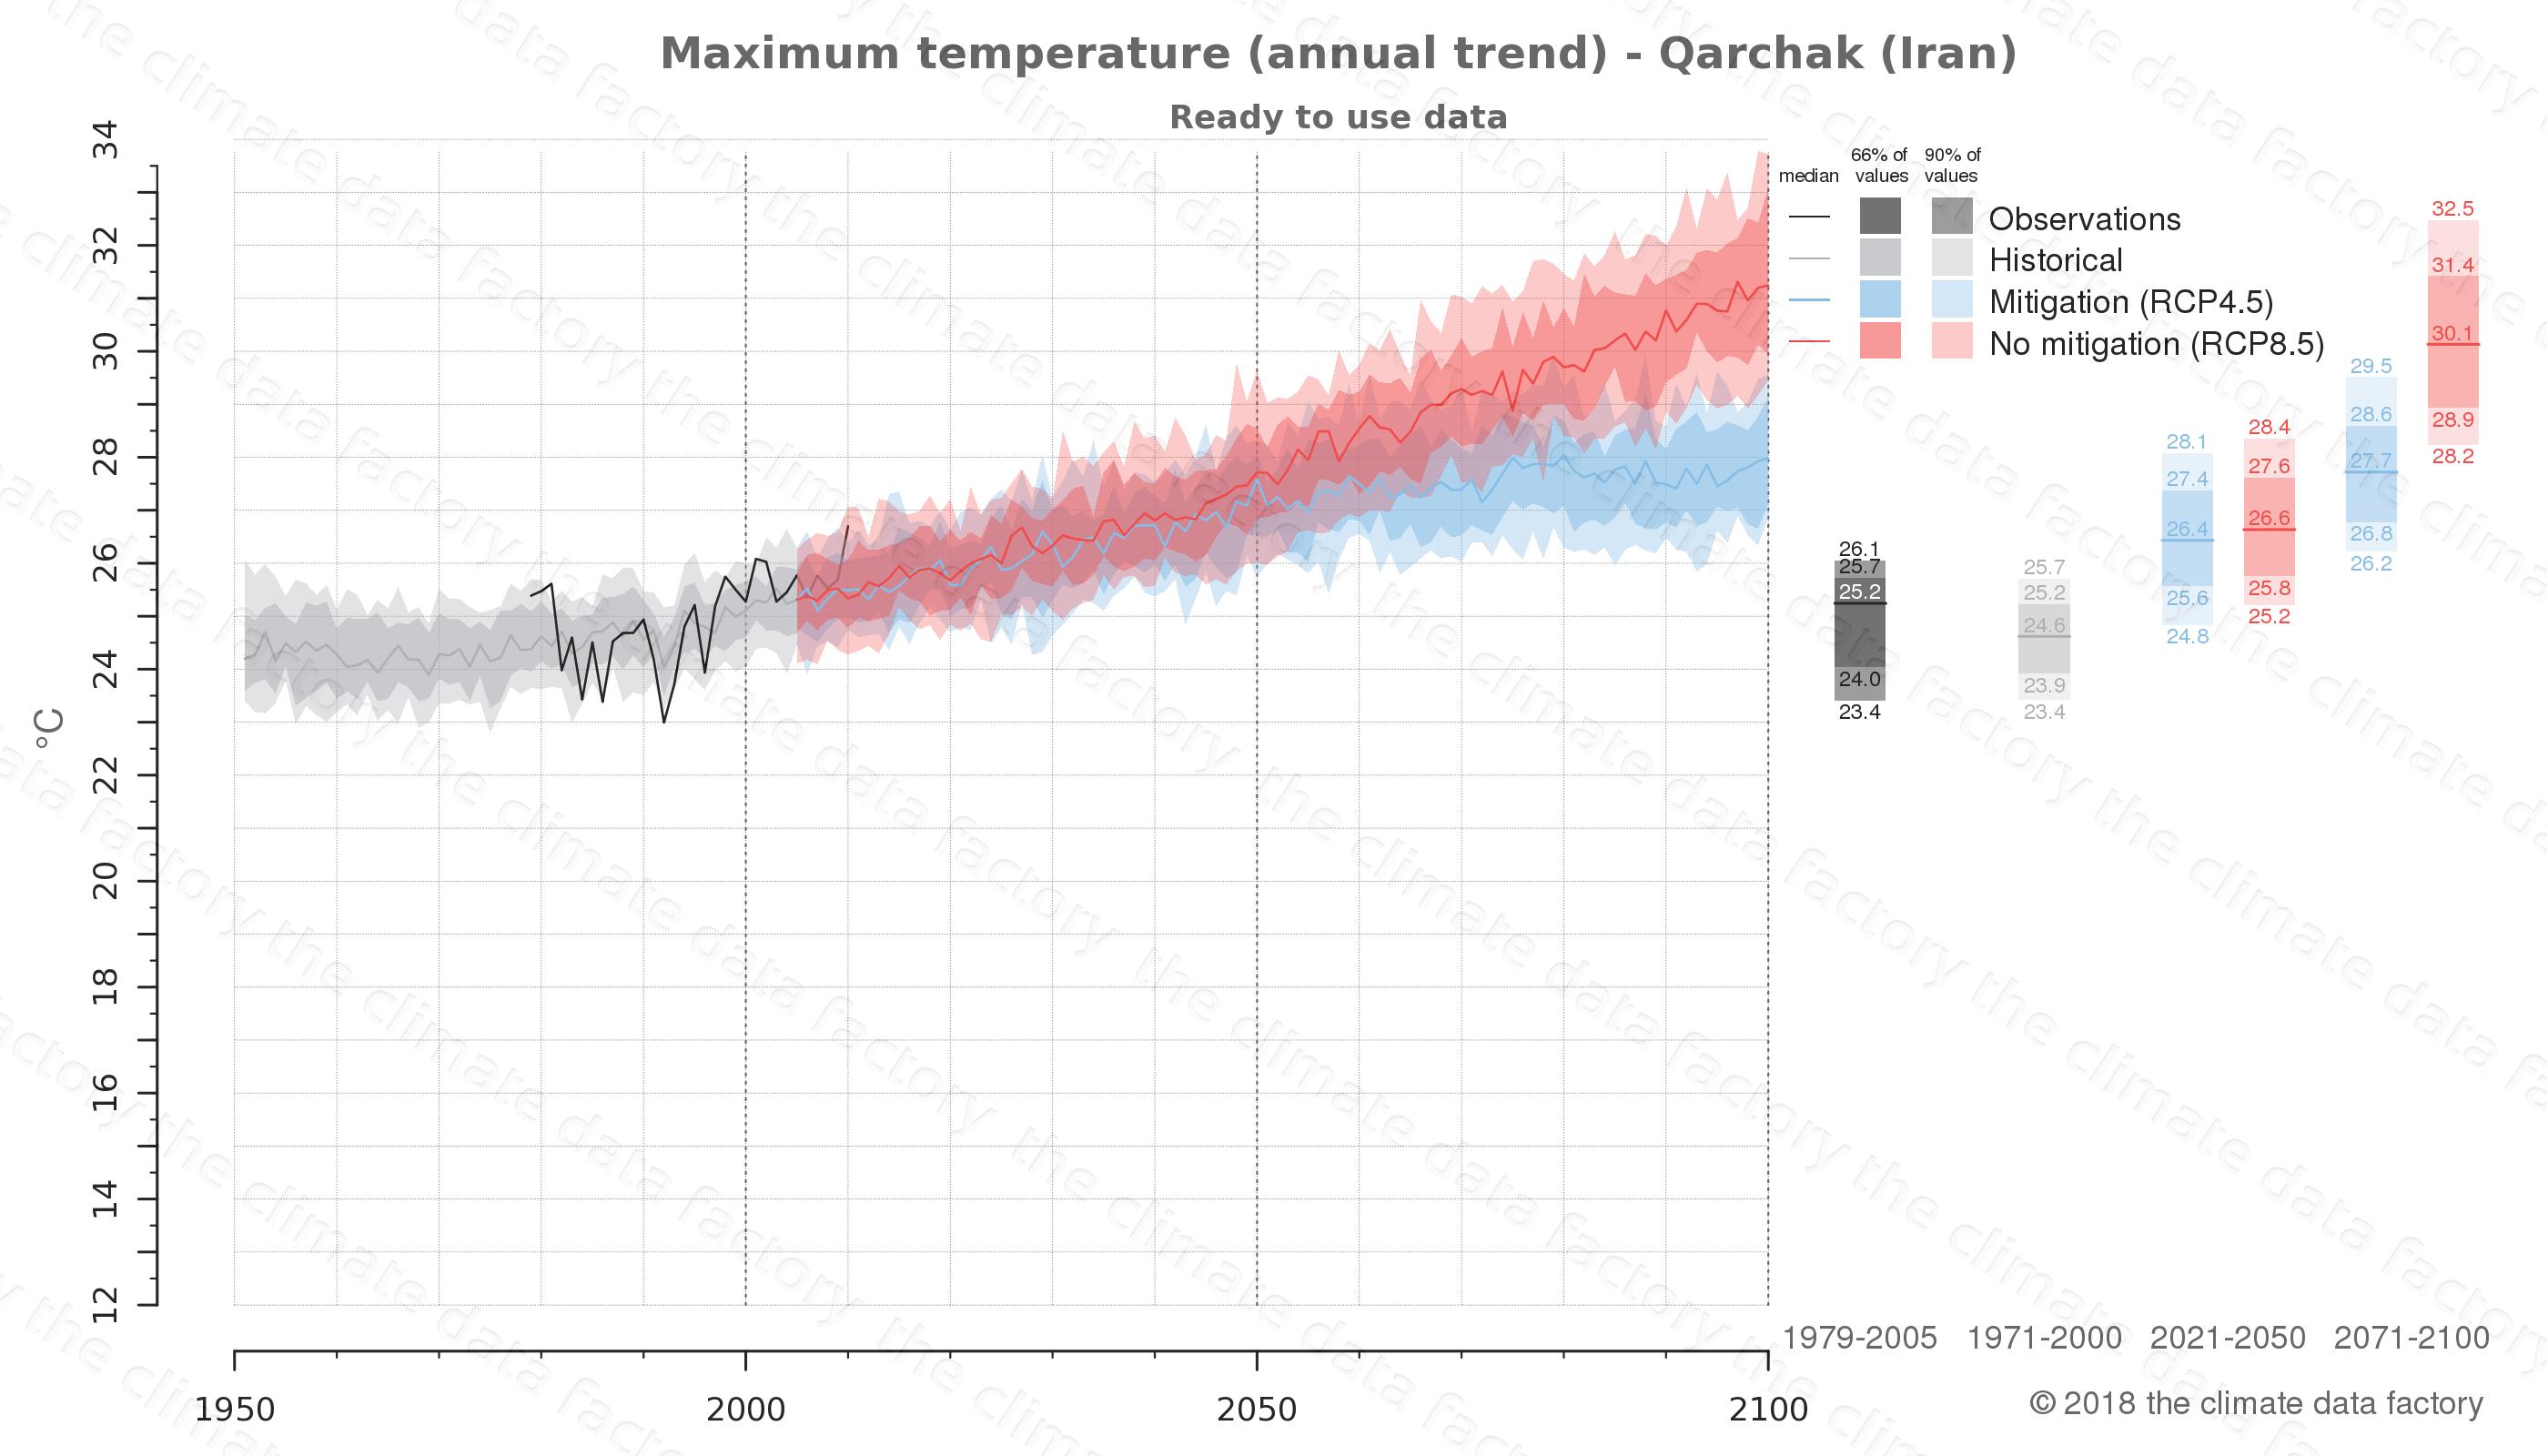 climate change data policy adaptation climate graph city data maximum-temperature qarchak iran